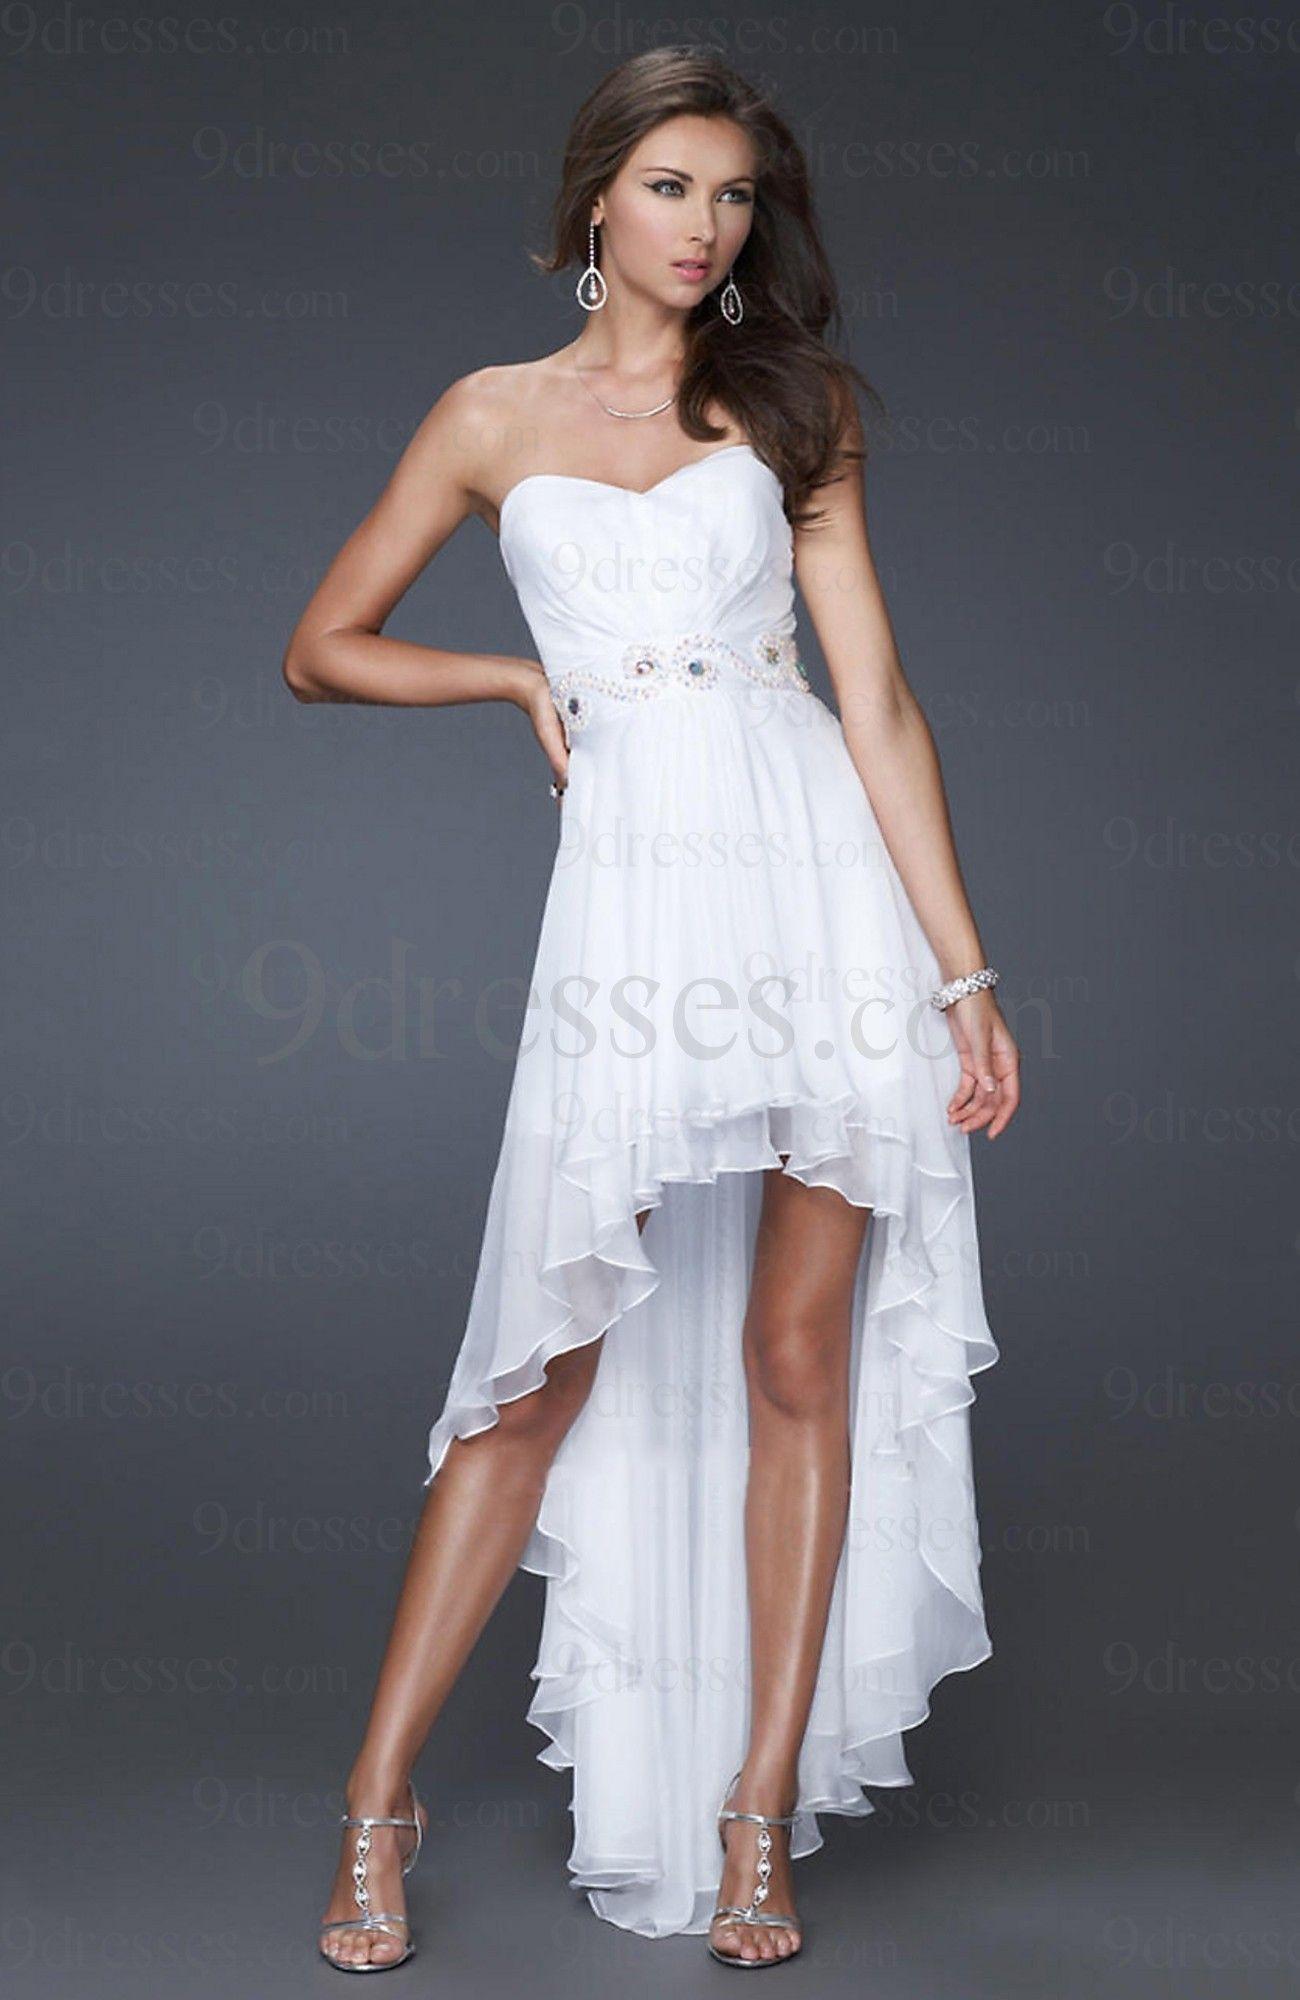 Cheap high low wedding dresses  I love this dress  My wedding  Pinterest  Wedding guest dresses